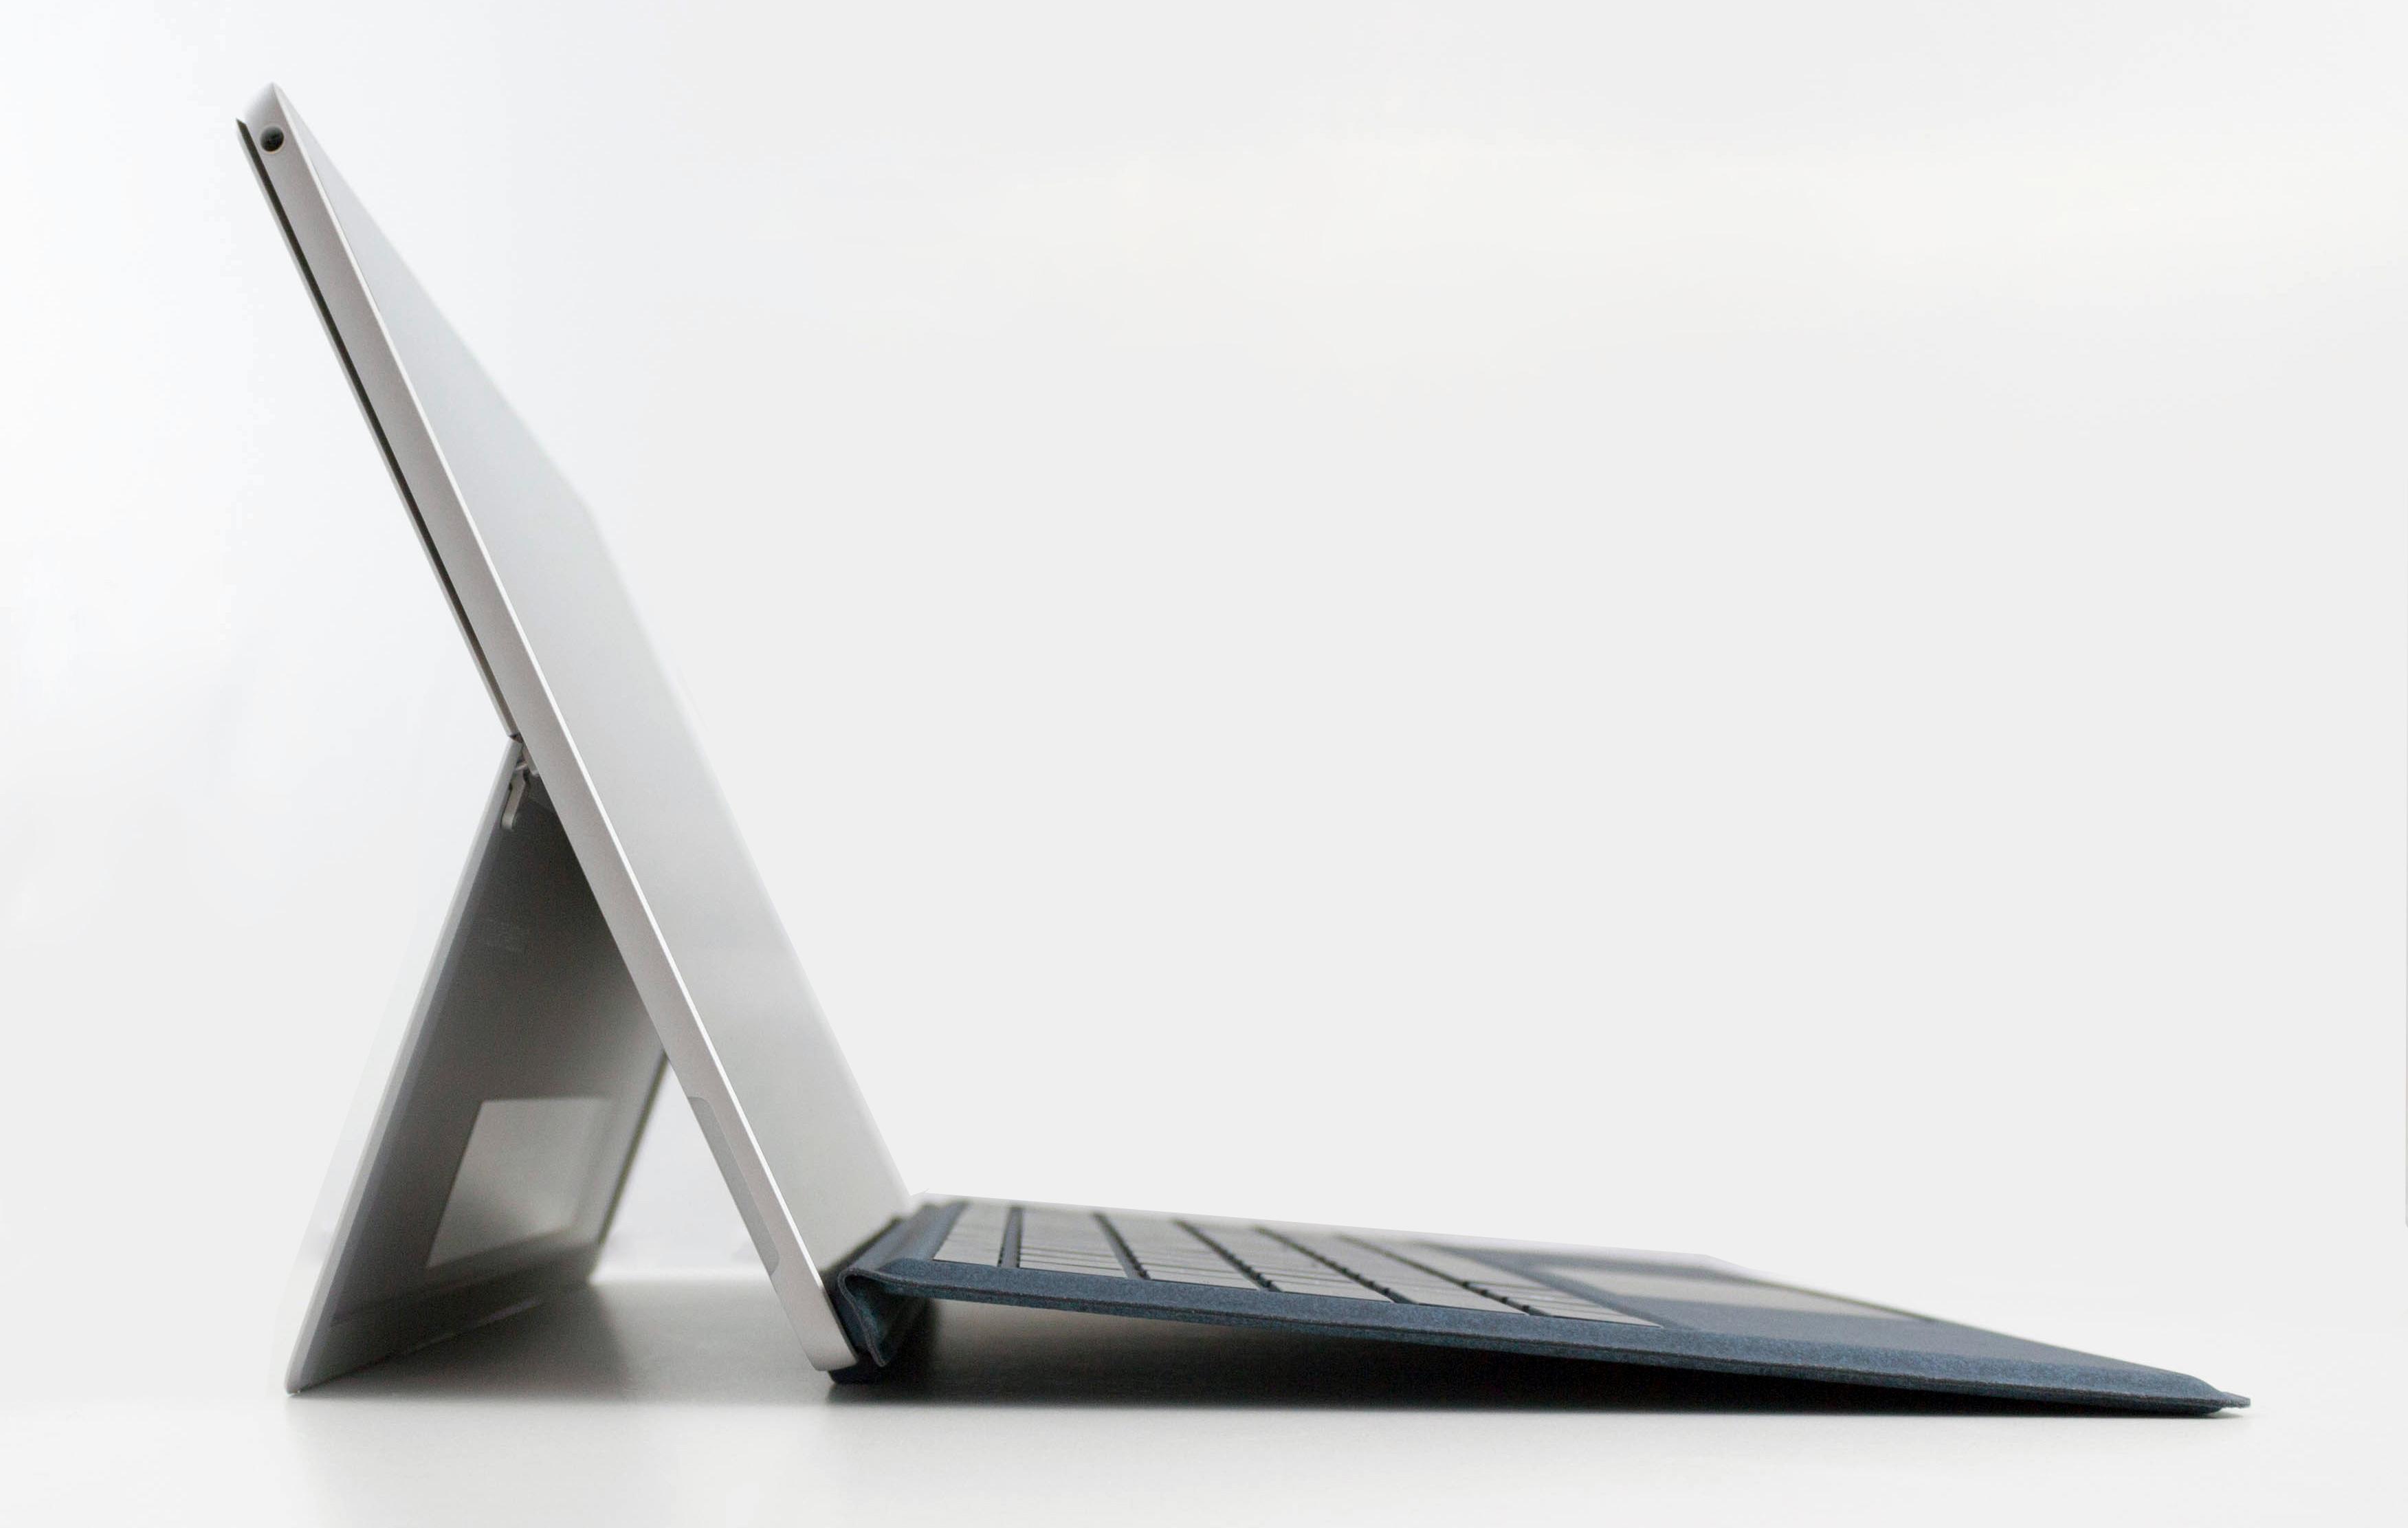 Info Harga Microsoft Surface Pro 5 Laptop Core I7 8gb 256gb Termurah Bonia Black Jam Tangan Pria Bn10111 1542 Final Words The 2017 Review Evolution Design